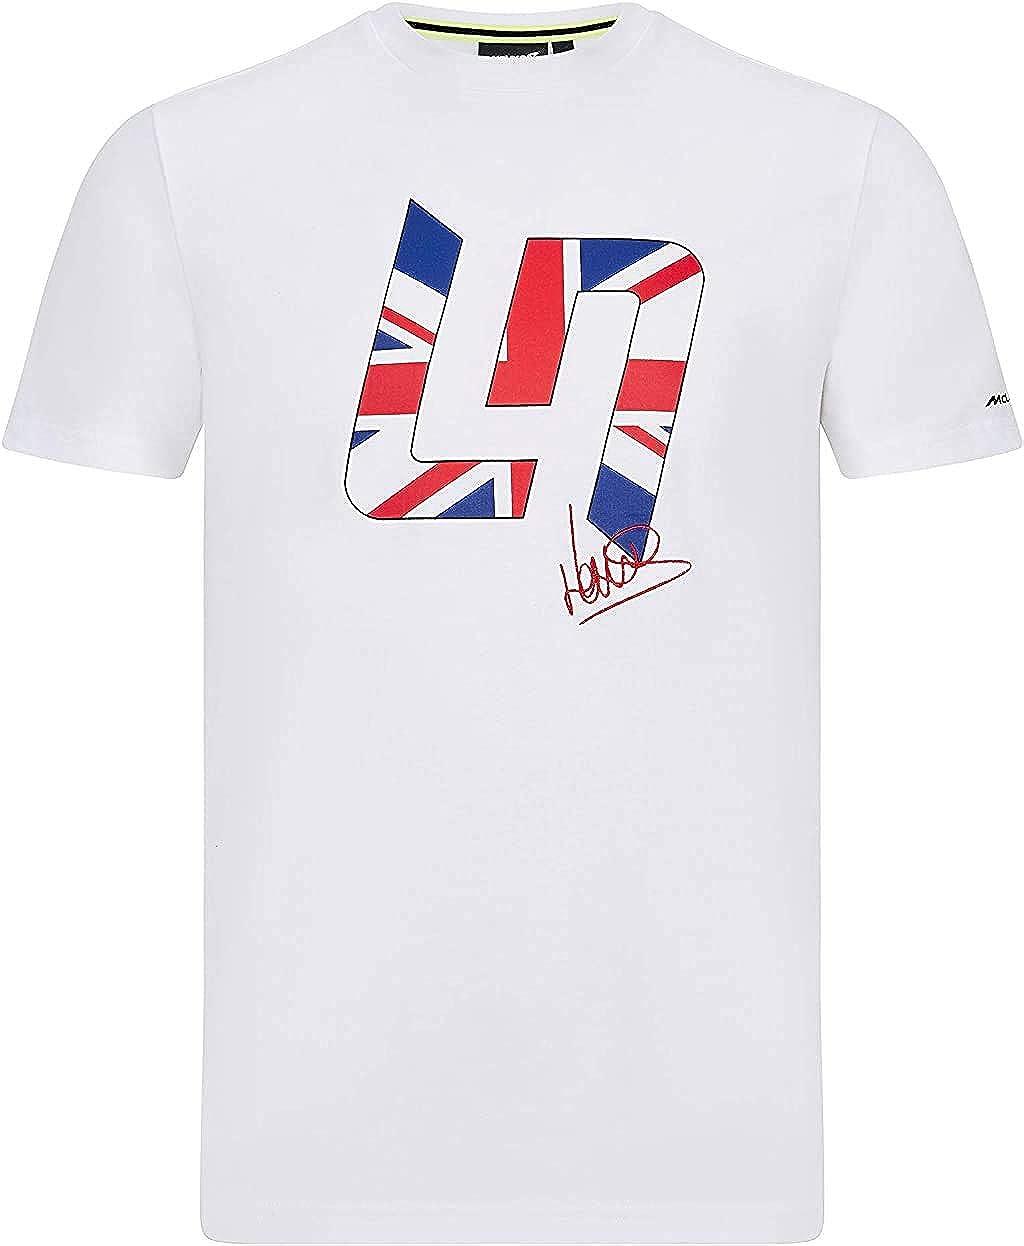 F1 McLaren Lando Norris Mens Great Britain T-Shirt White